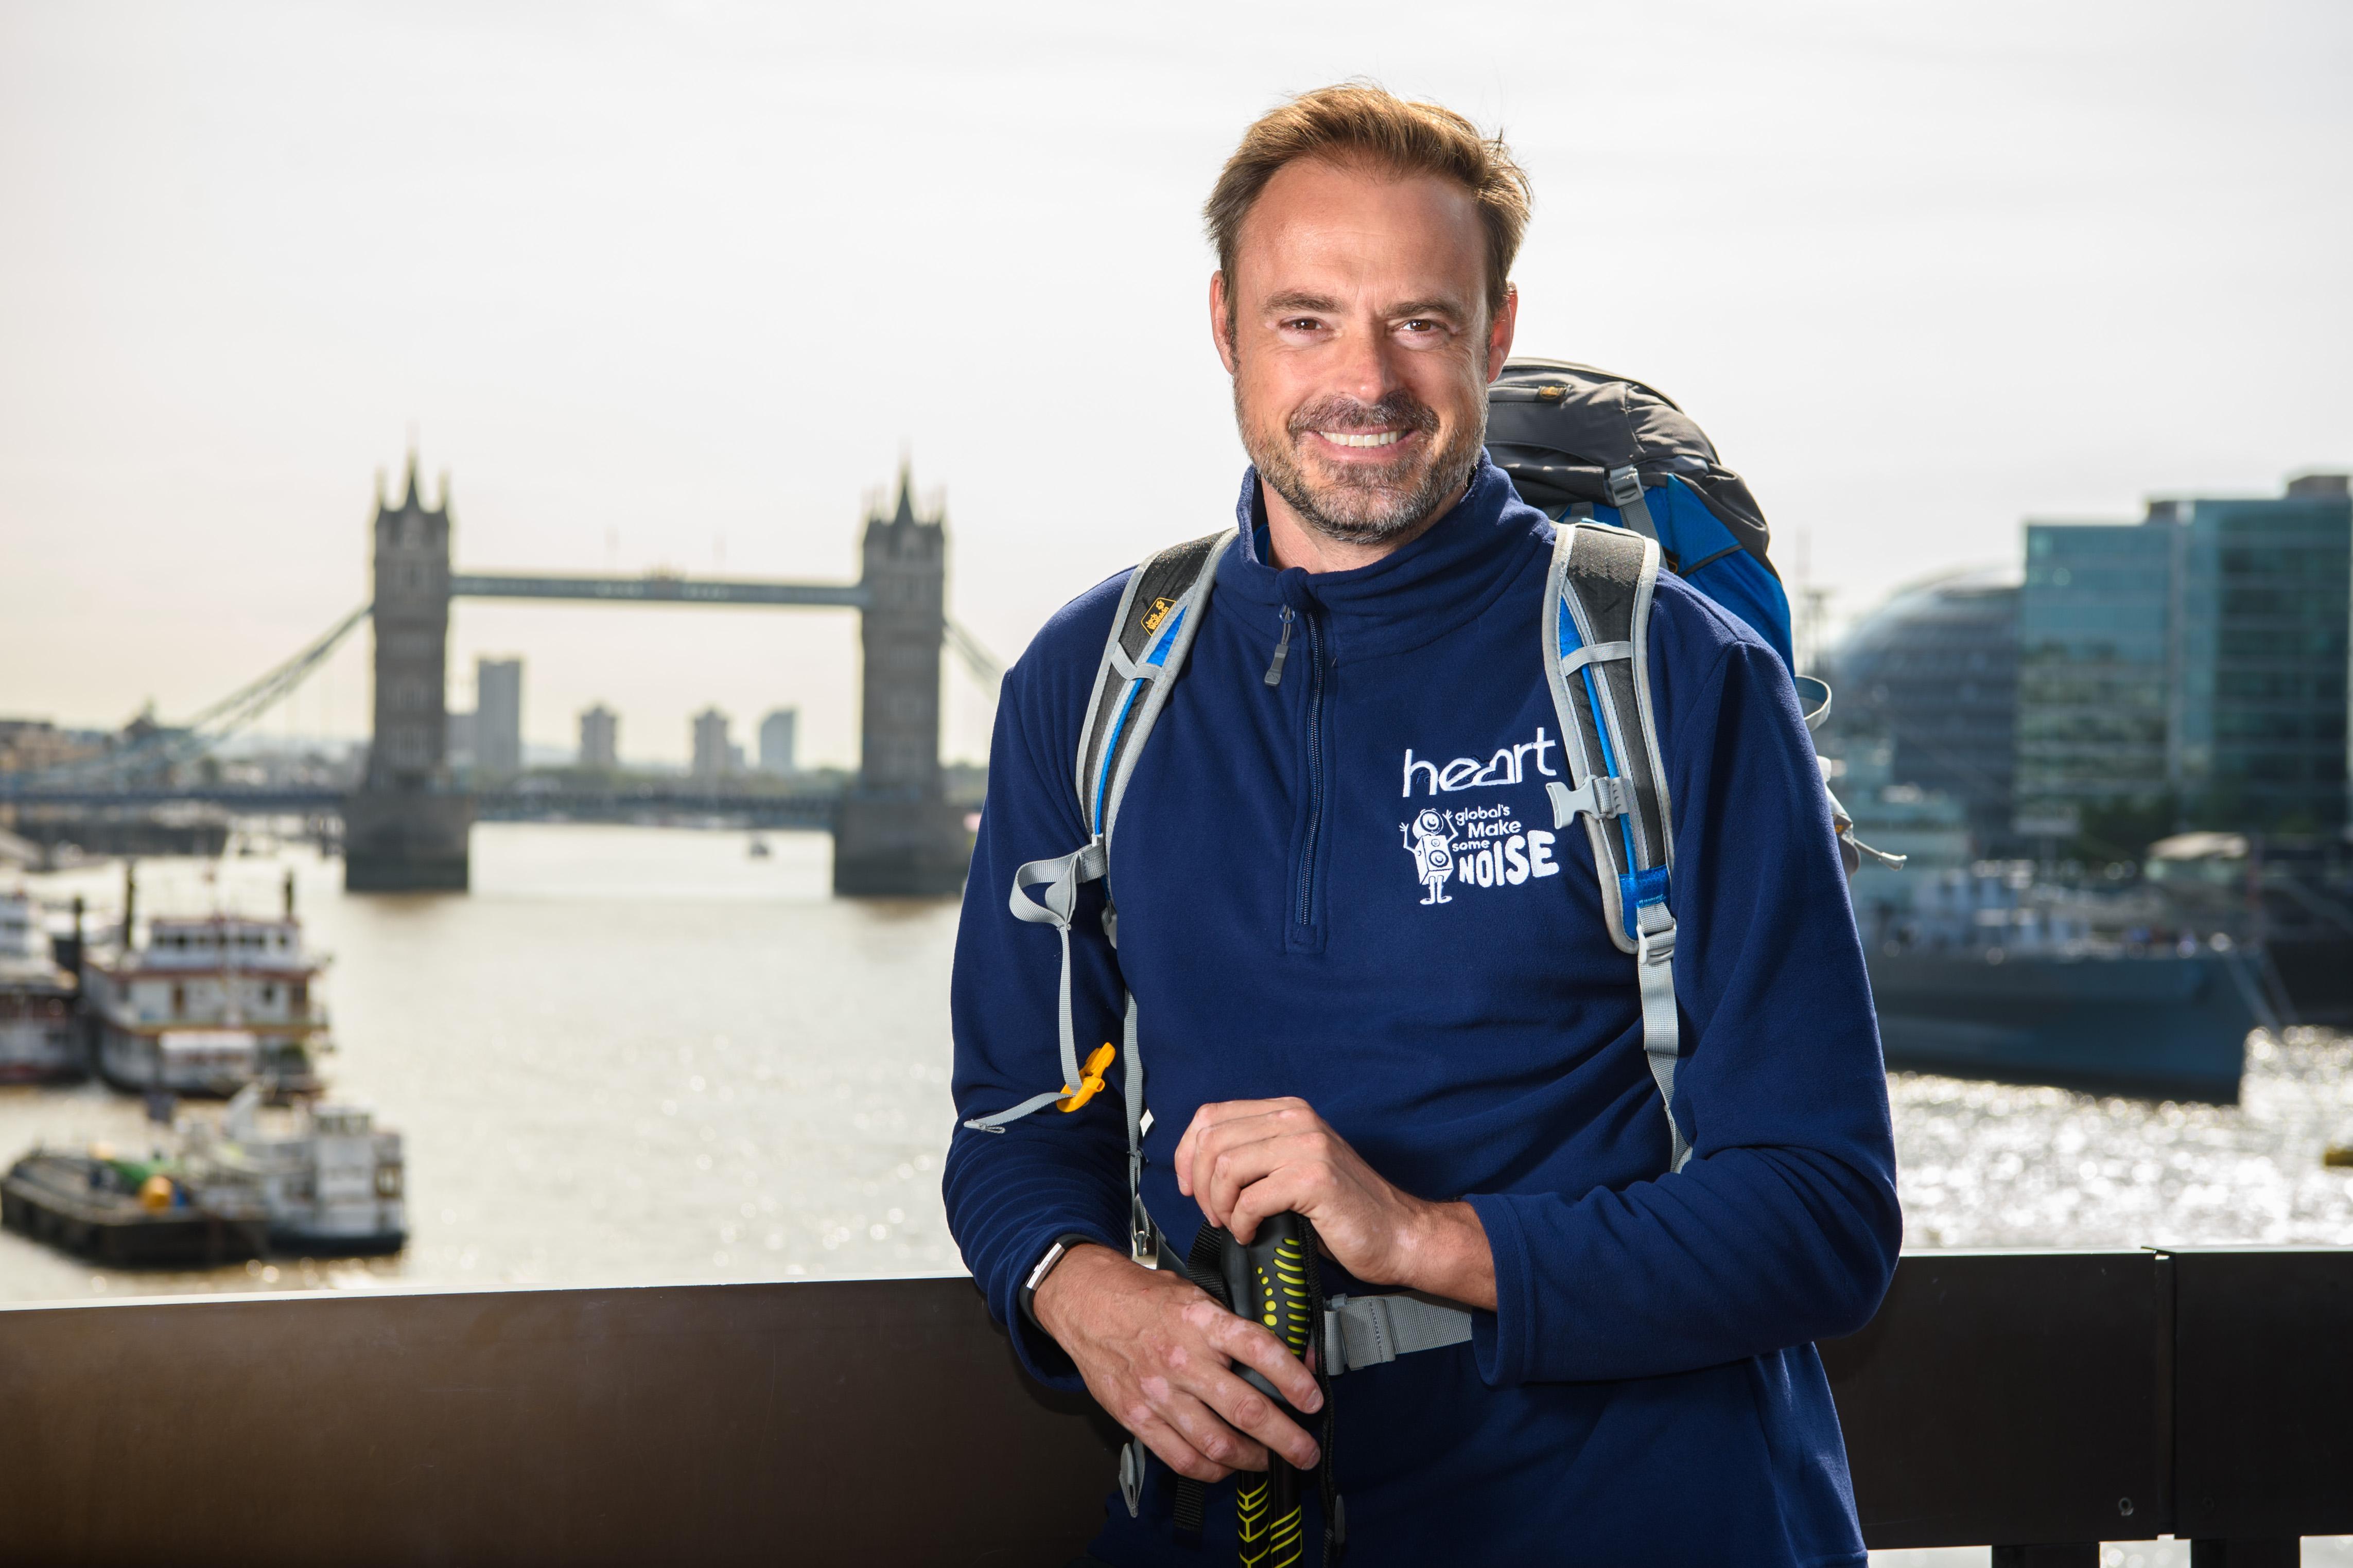 The Final Push! Heart's Jamie Theakston's Long Walk to London